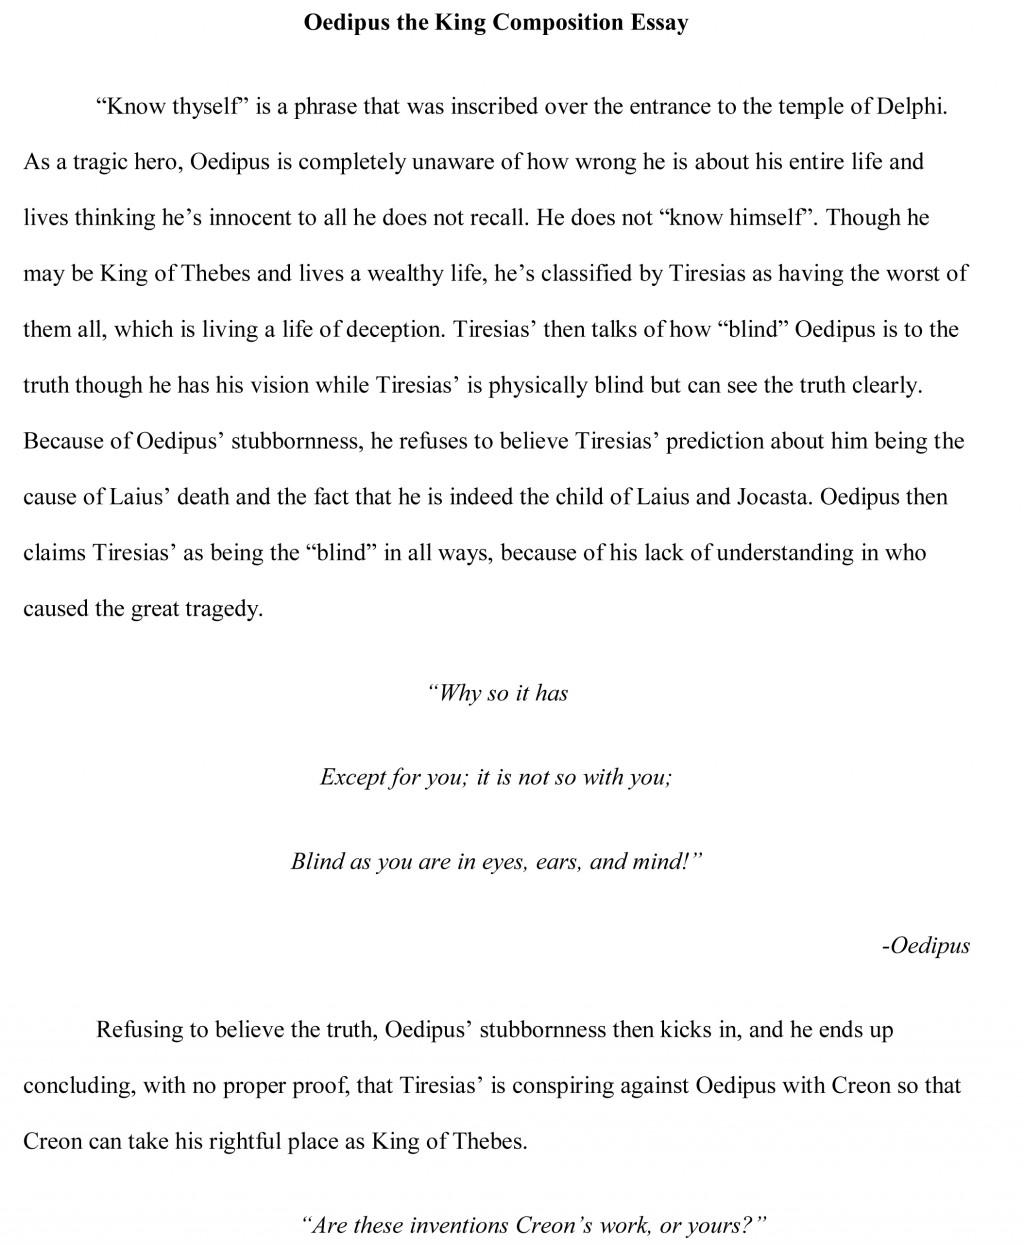 005 Oedipus Essay Free Sample Good Topics To Write An On Marvelous Easy Persuasive Essays Opinion Large